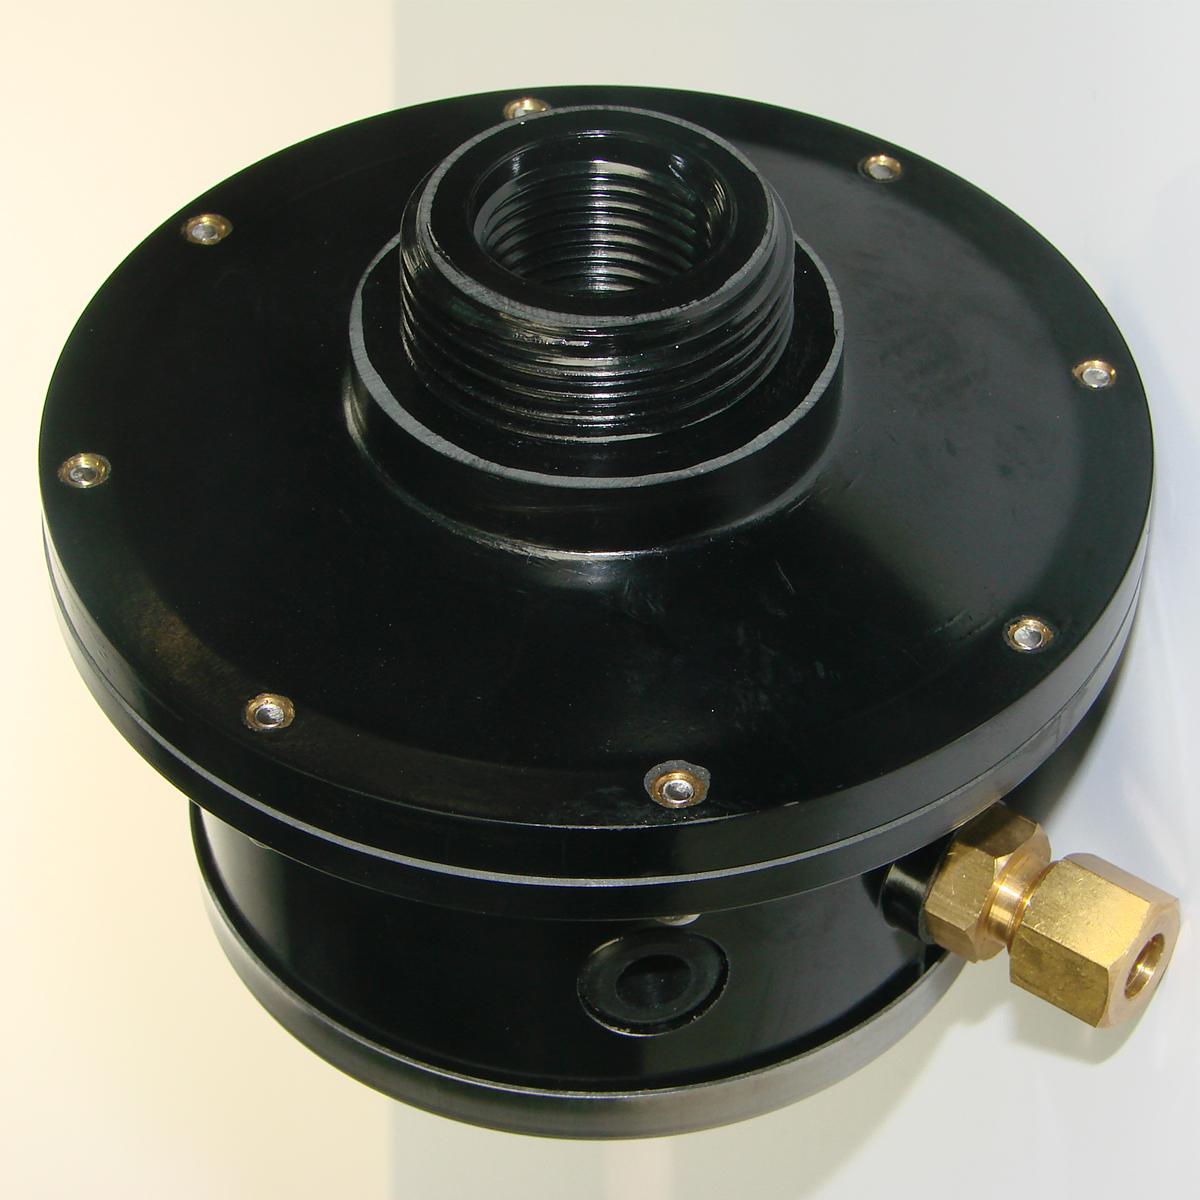 NOHKEN FP series เครื่องวัดระดับของเหลวแบบใช้ความดัน